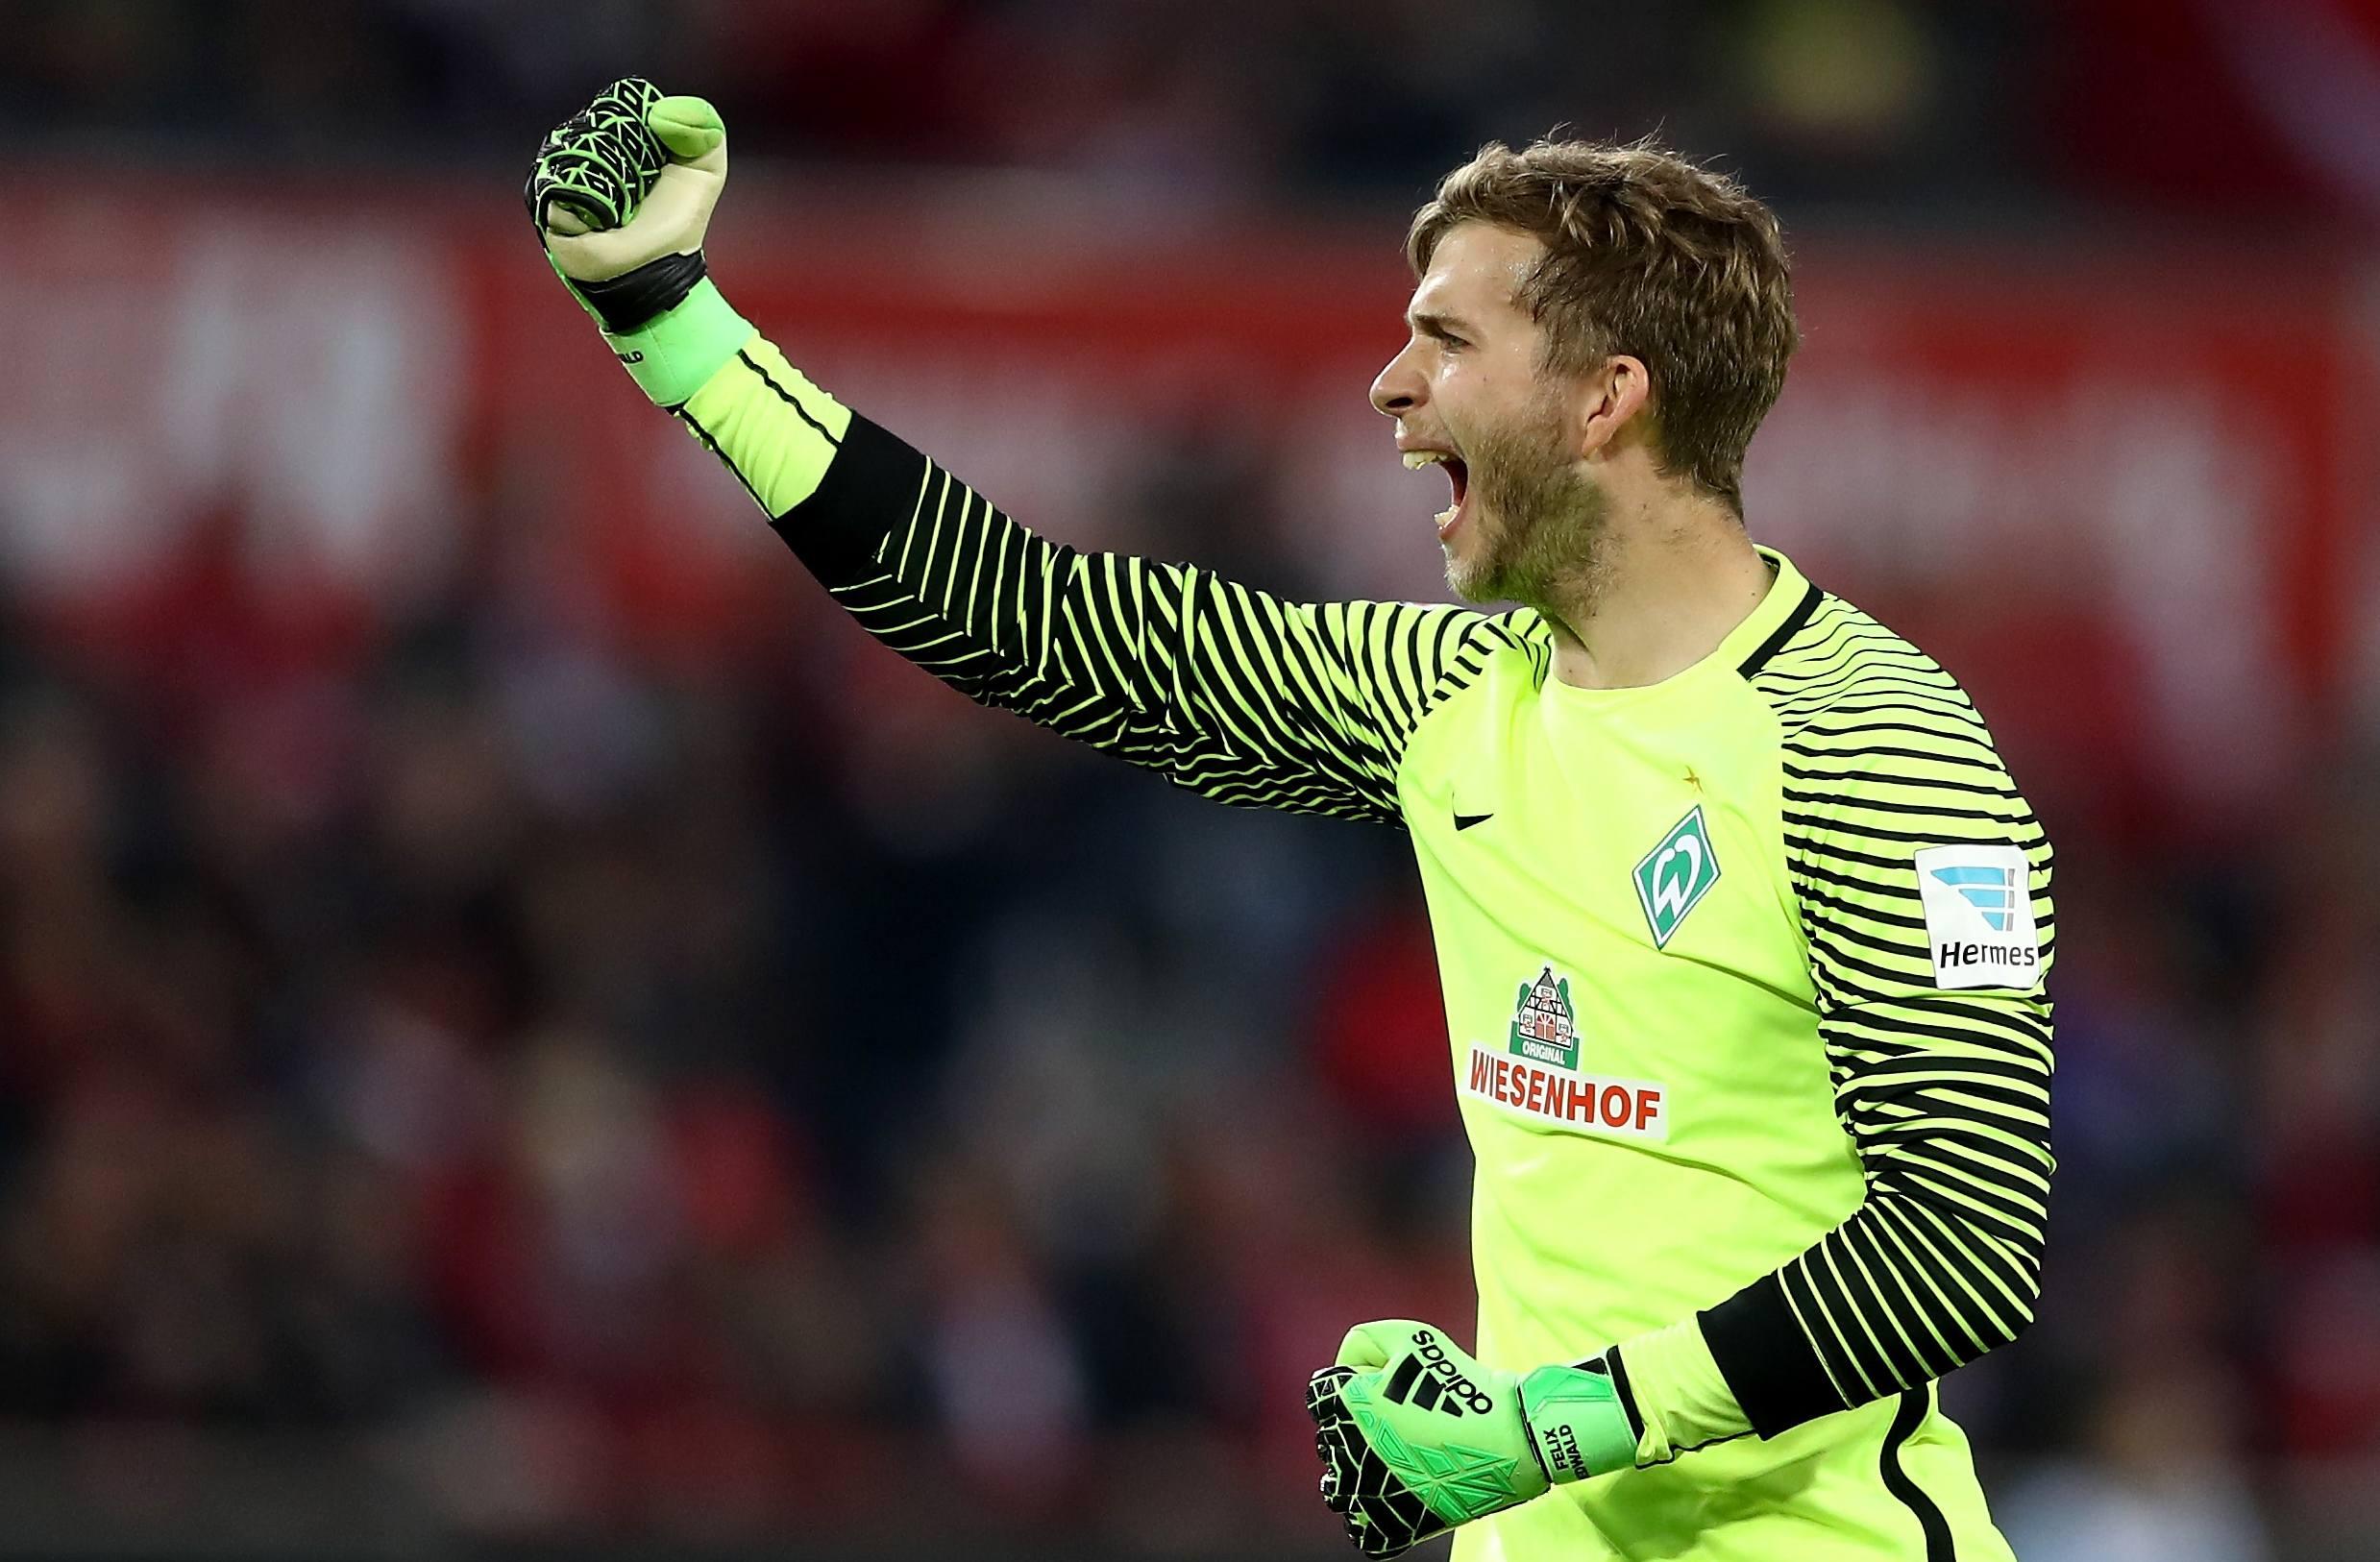 bundesliga transfers 2019/18